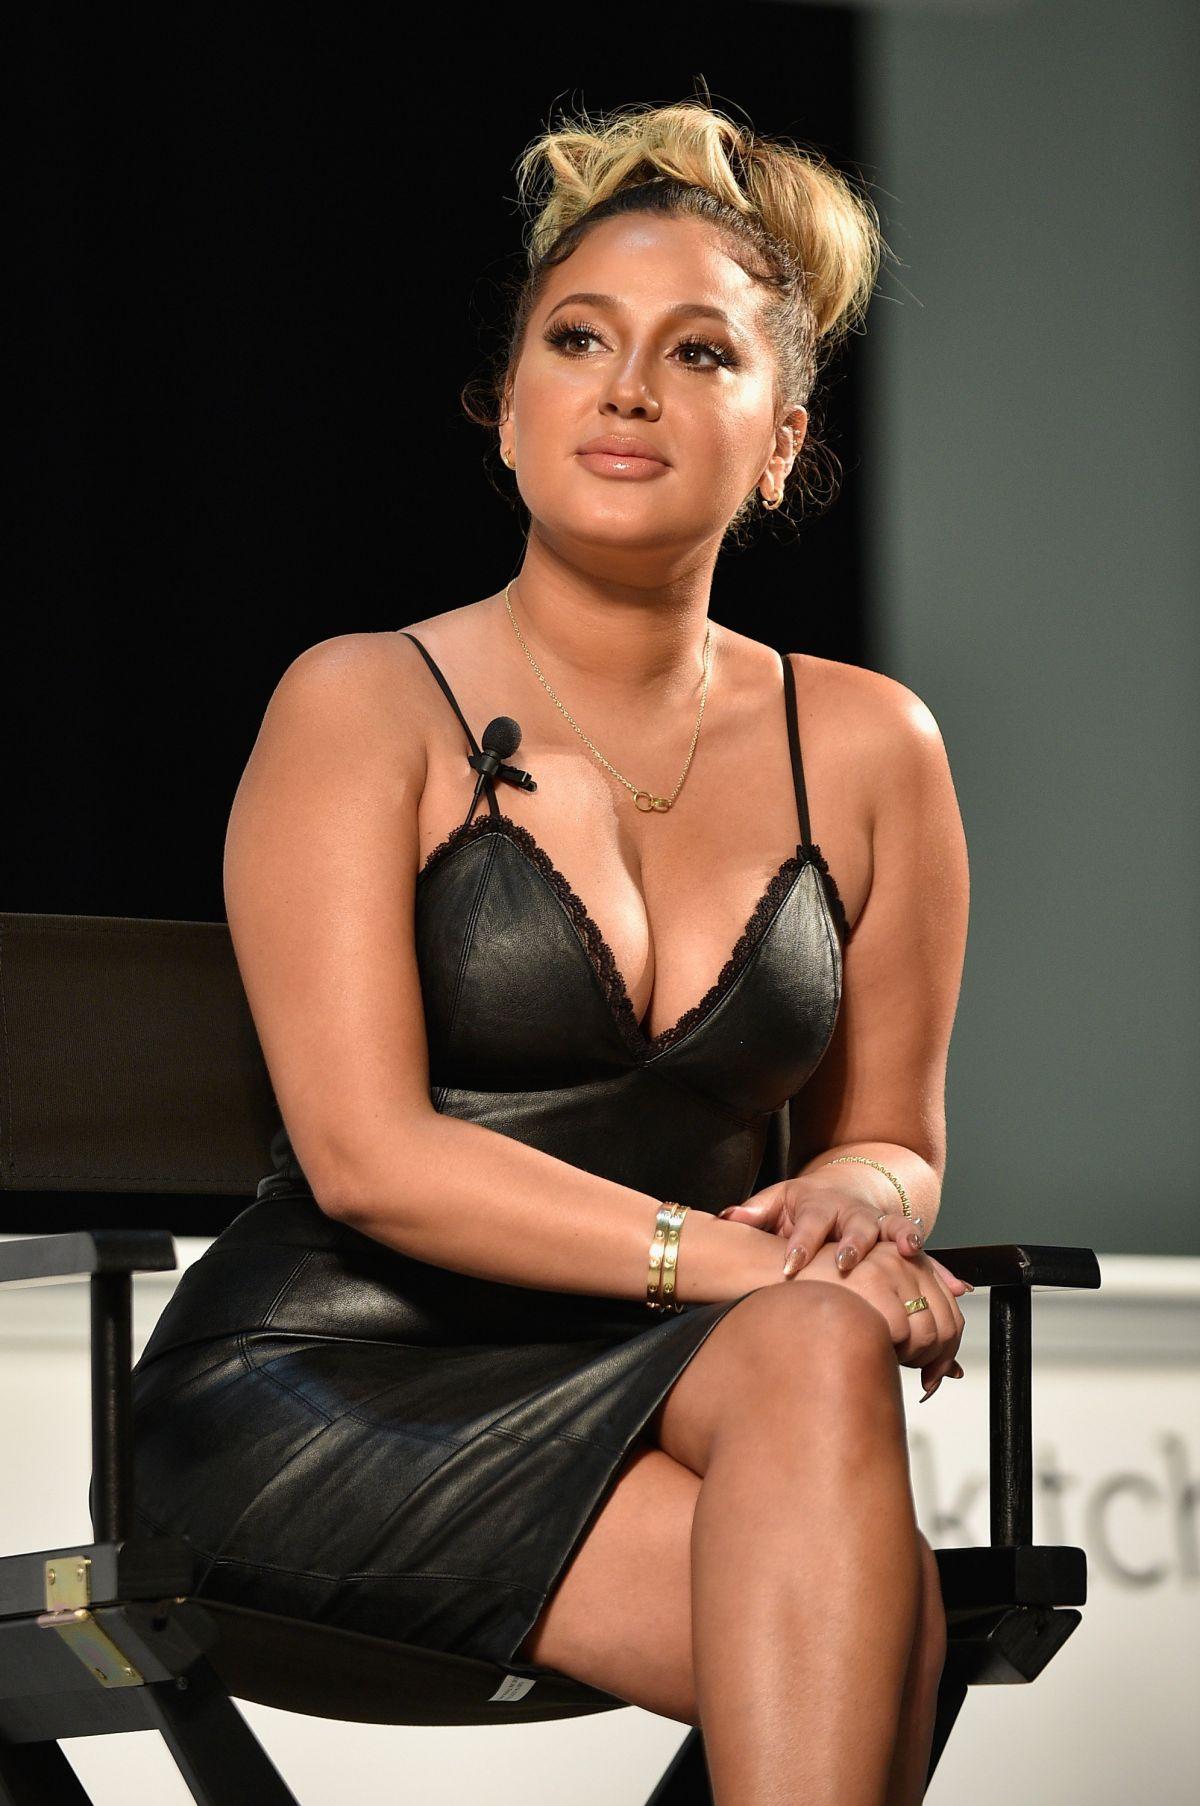 Dulce Castañeda - A busty latina, just a bit chubby - Plus